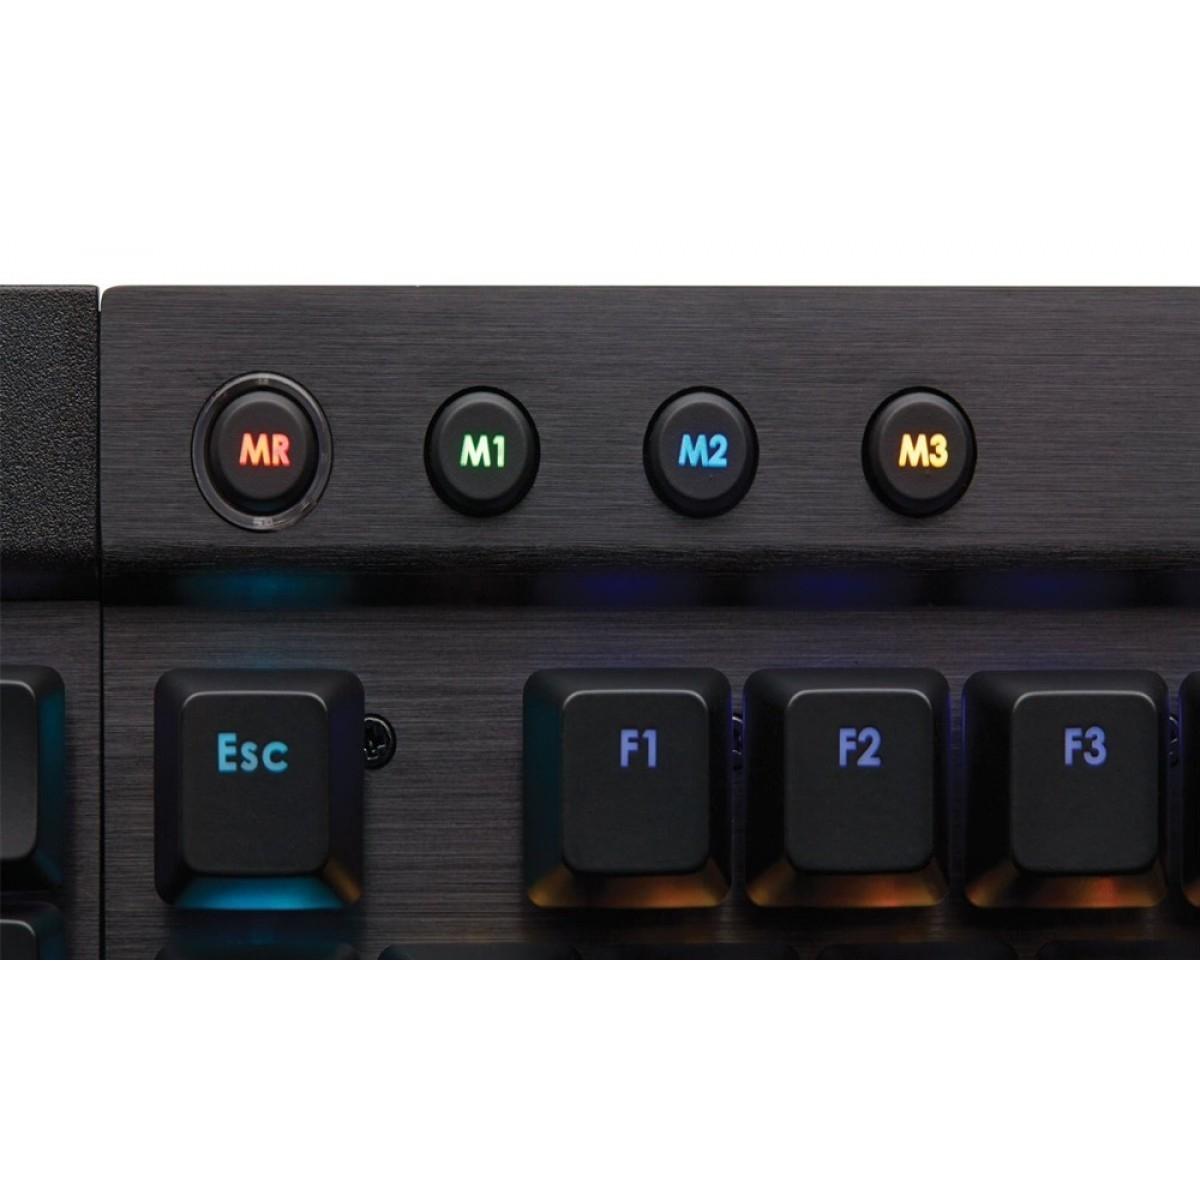 Teclado Mecânico Gamer Corsair K95 RGB Switch Cherry MX Red CH-9000220-BR ABNT2